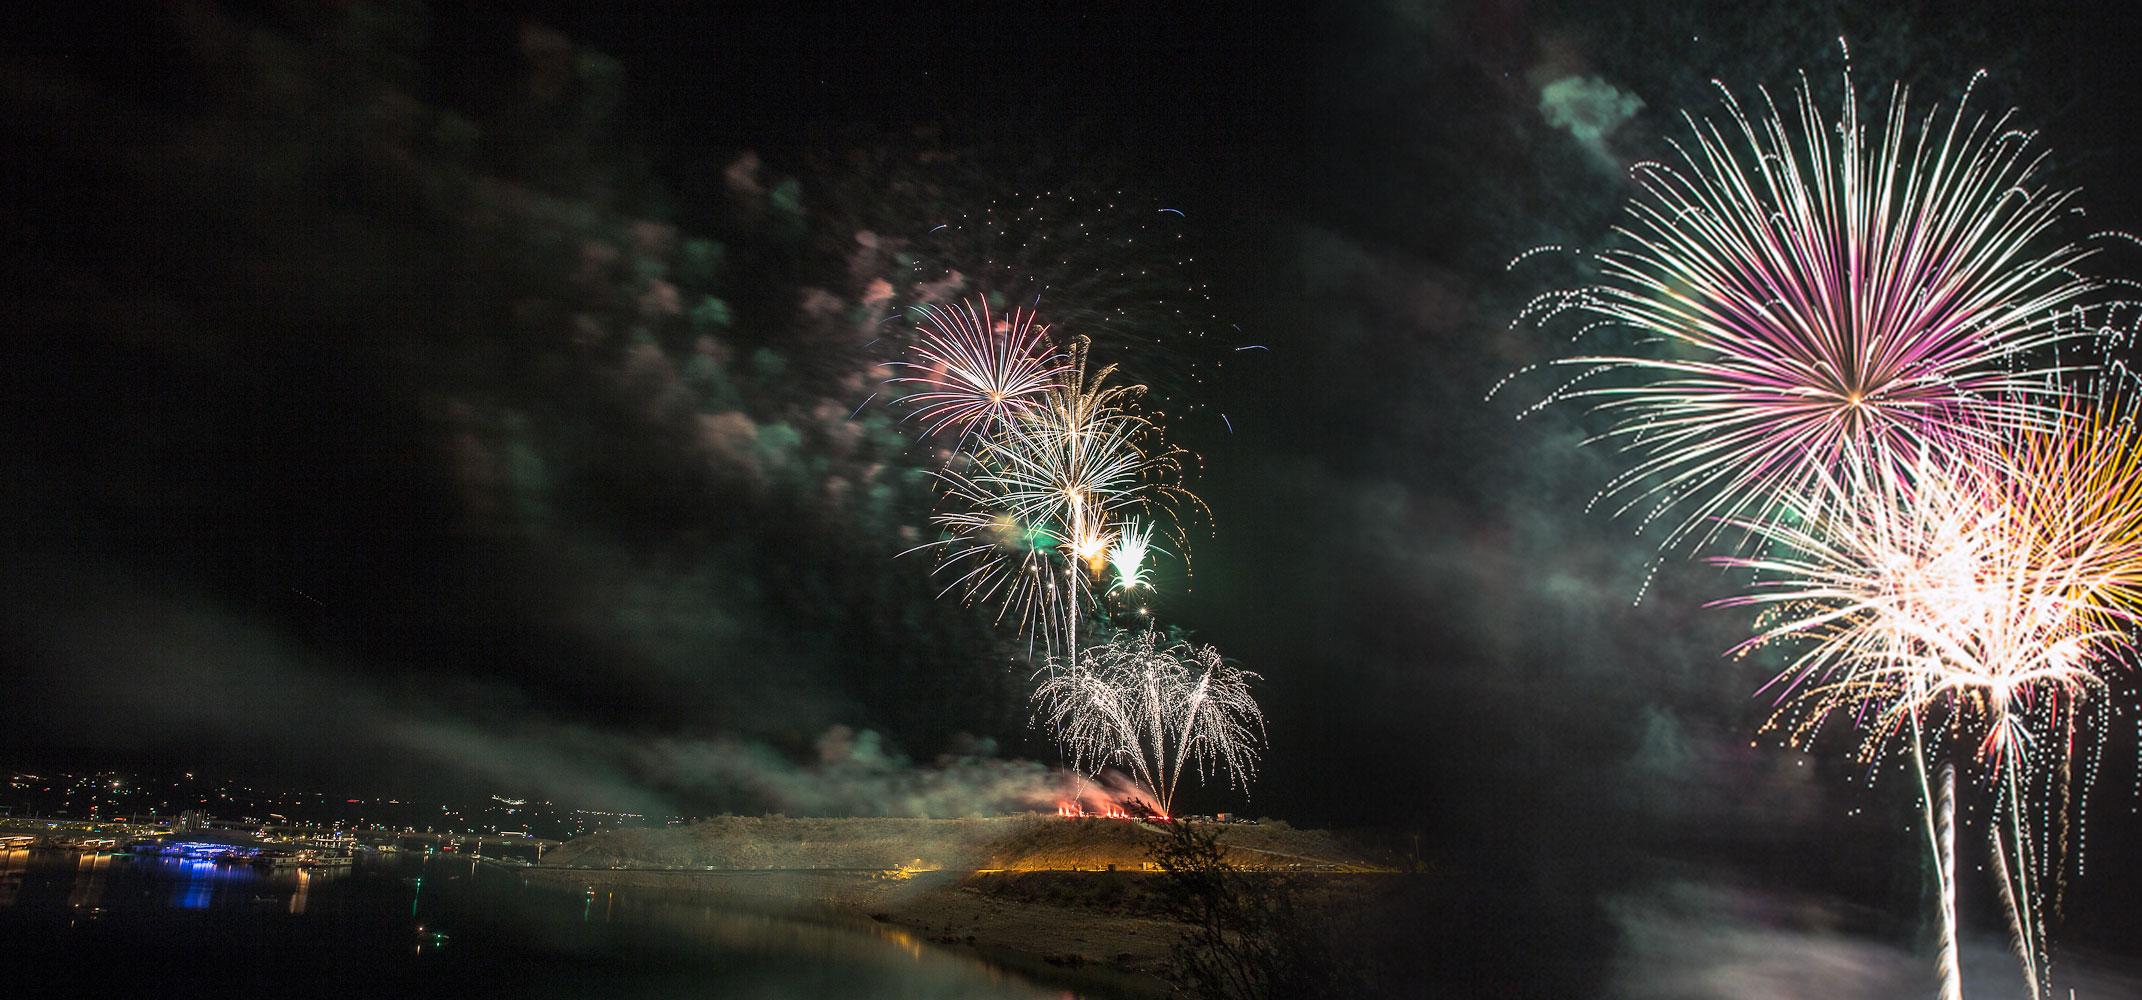 Tempe town lake fireworks 2020